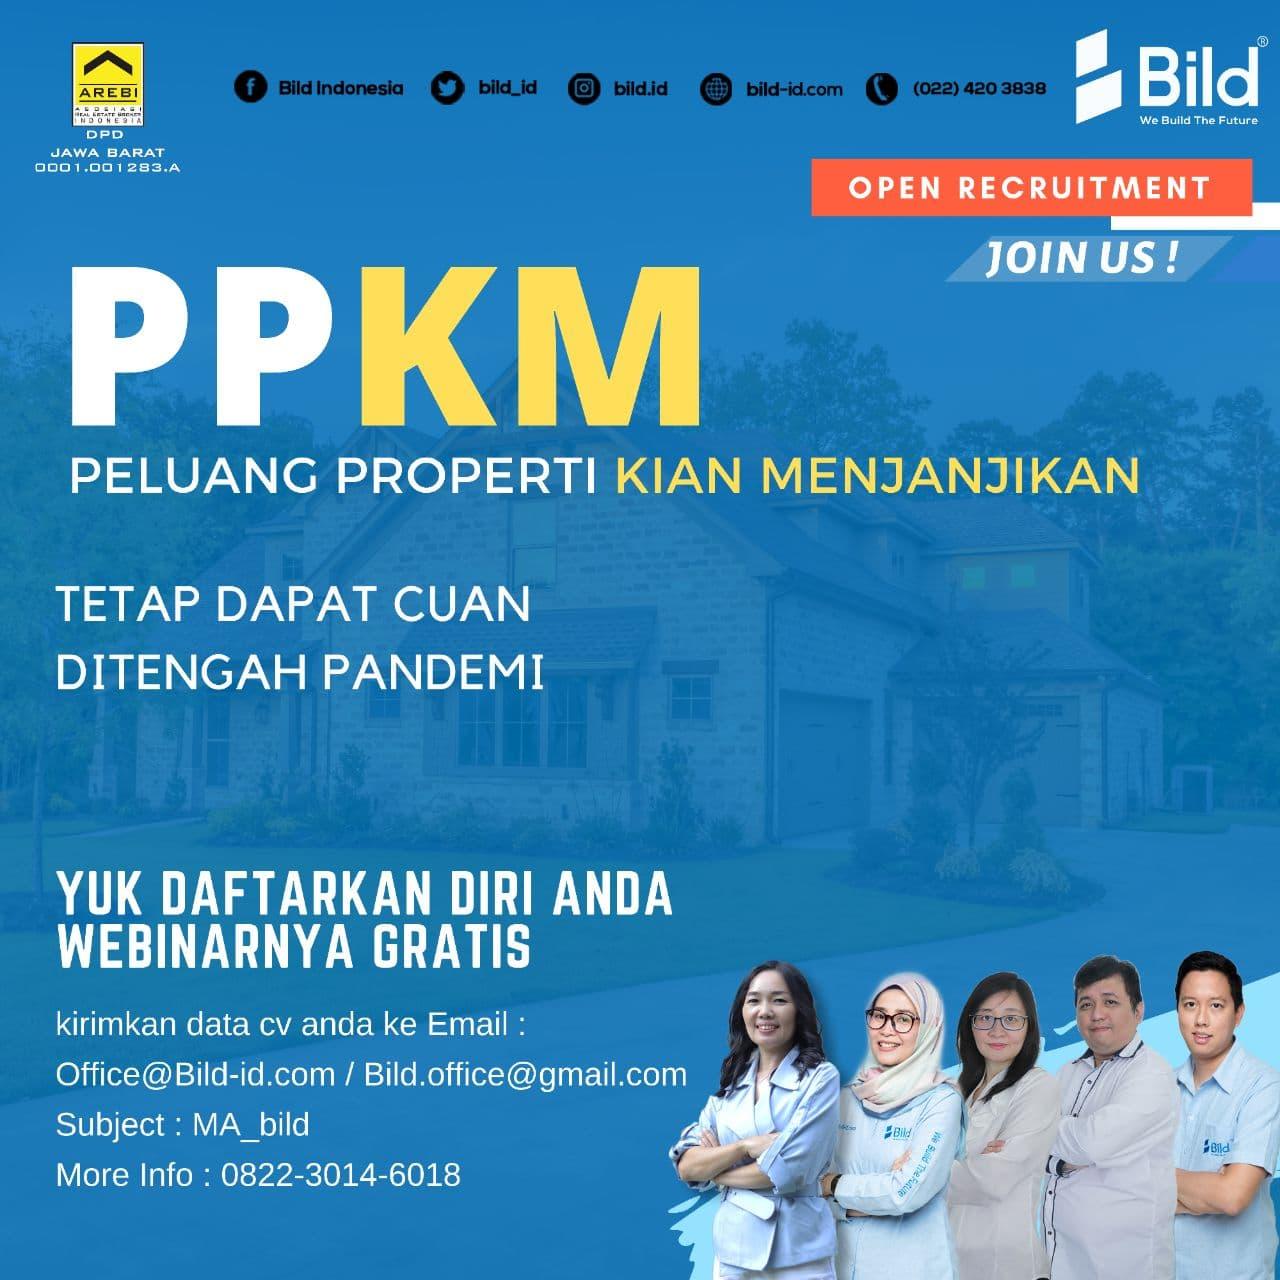 Lowongan Kerja Bild.id Bandung Juli 2021